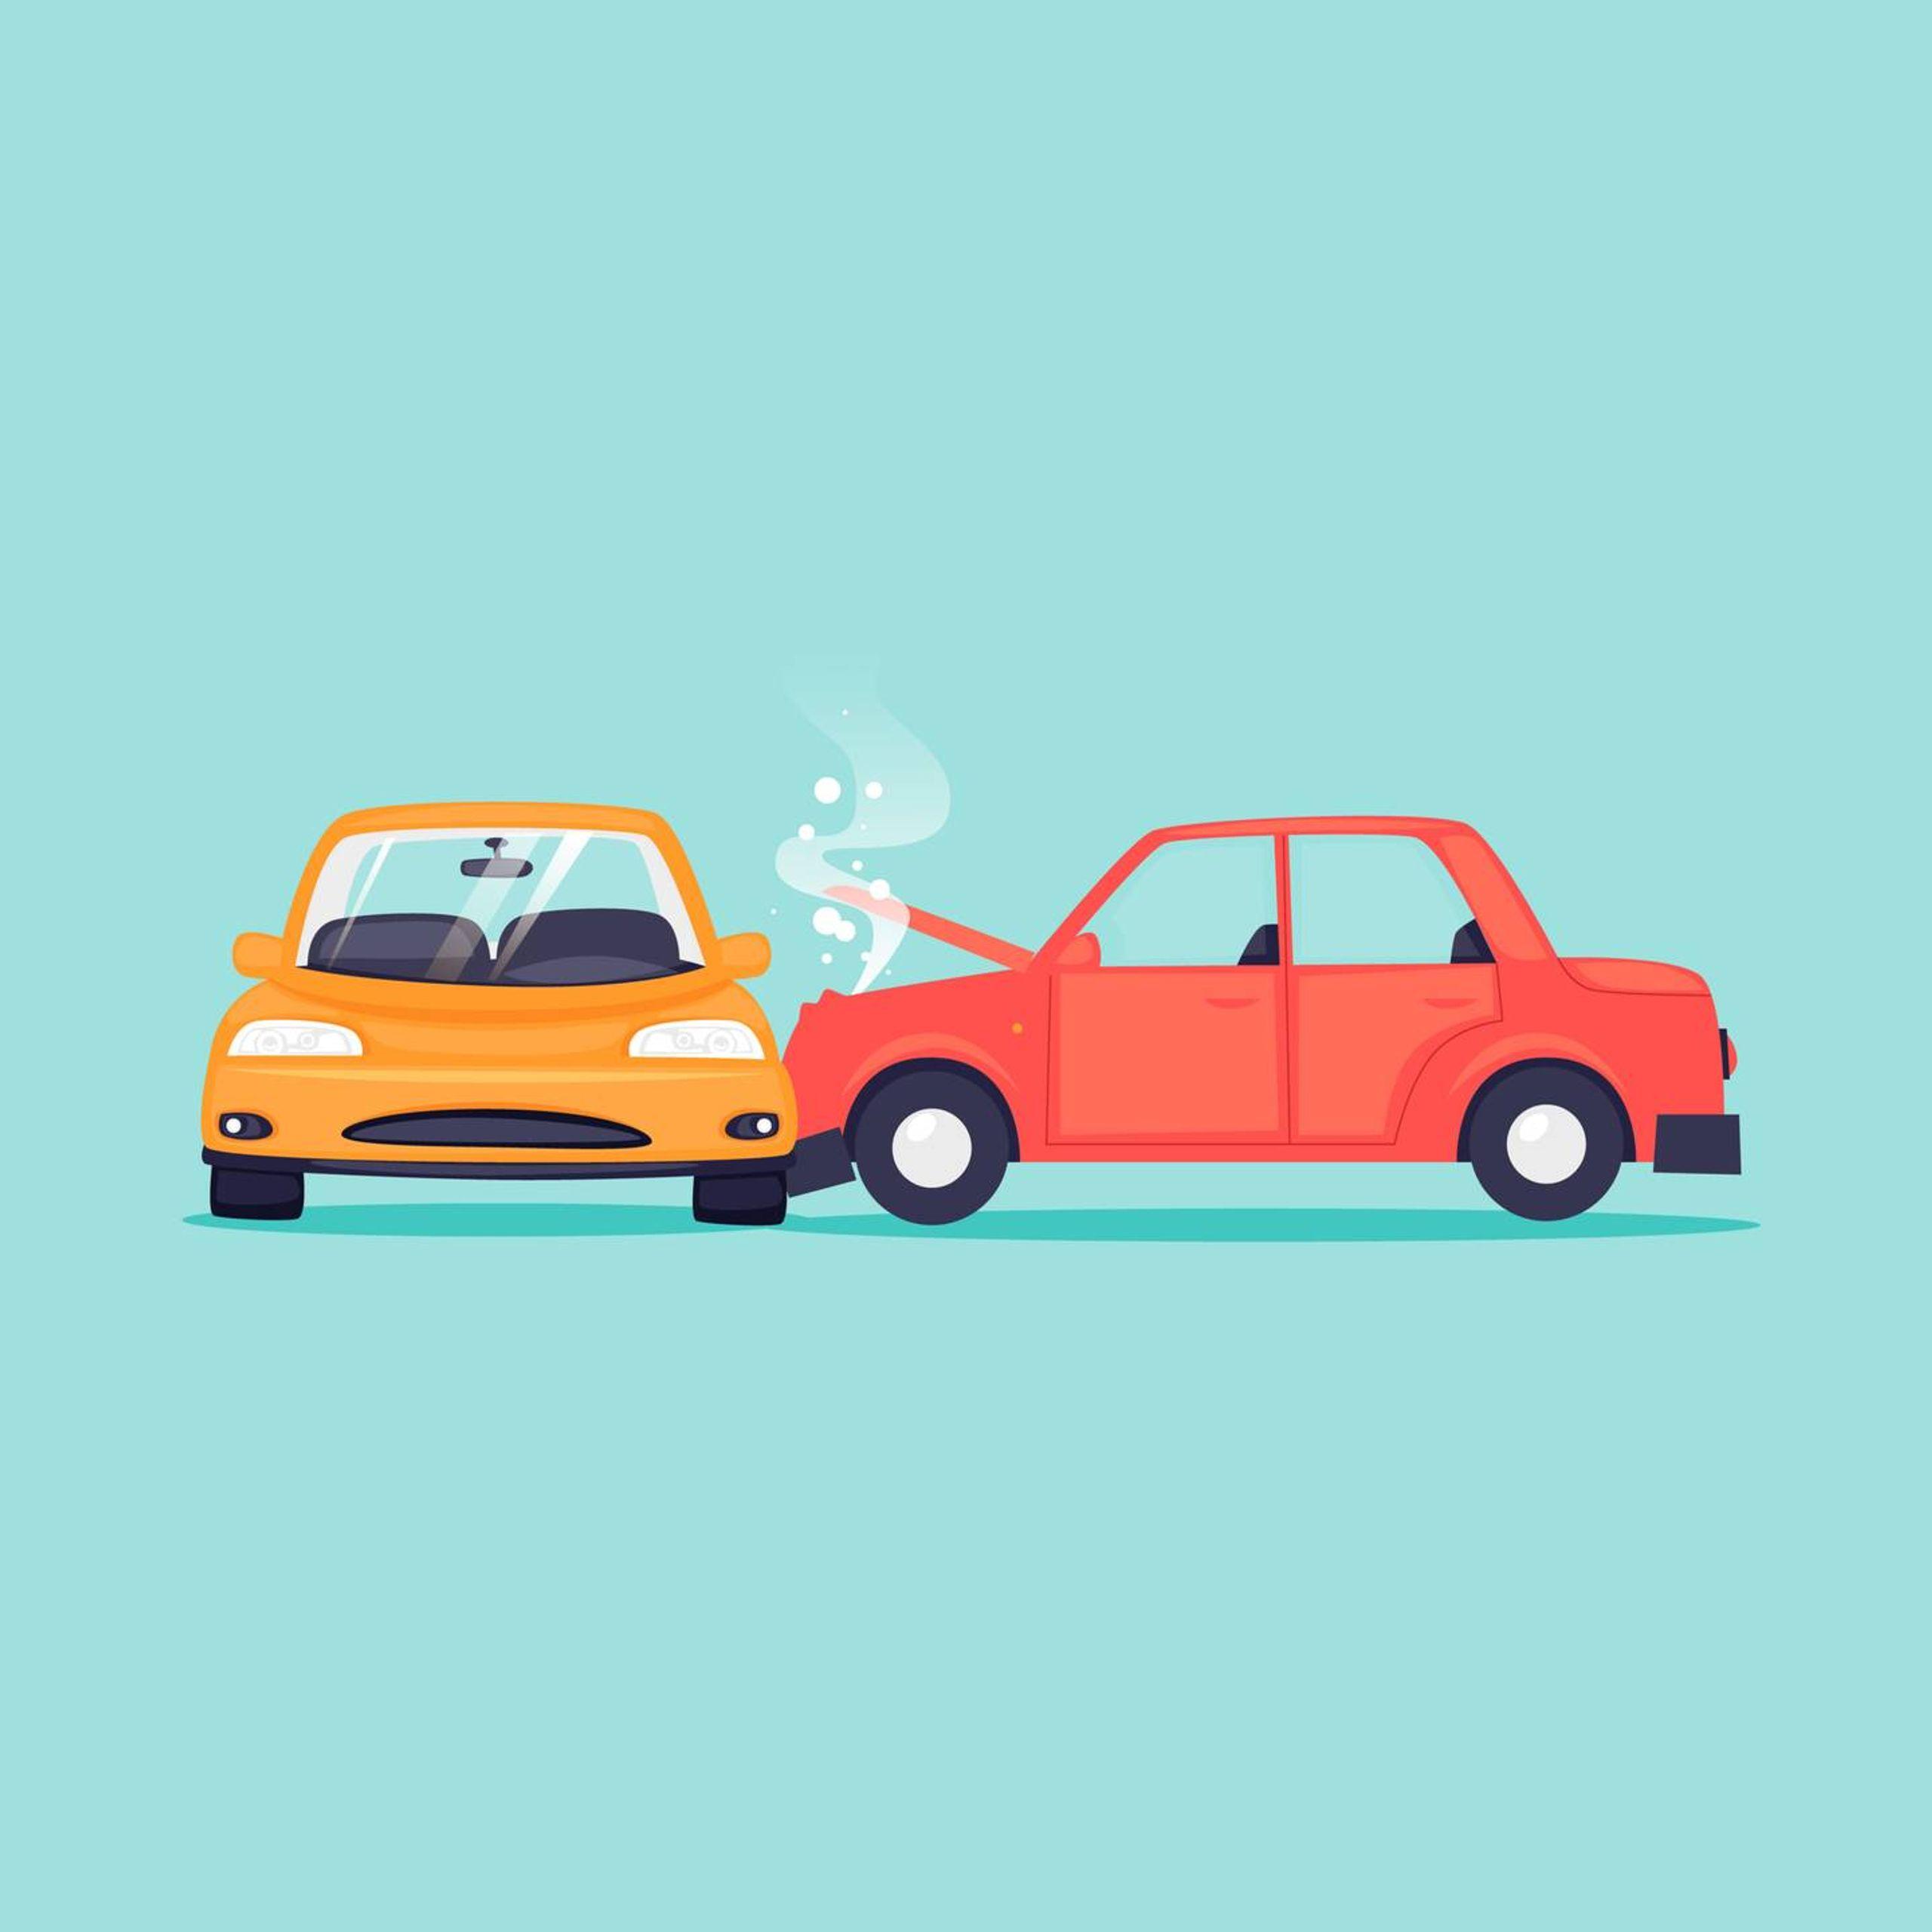 Illustration of a car accident, Rewire, car crashes